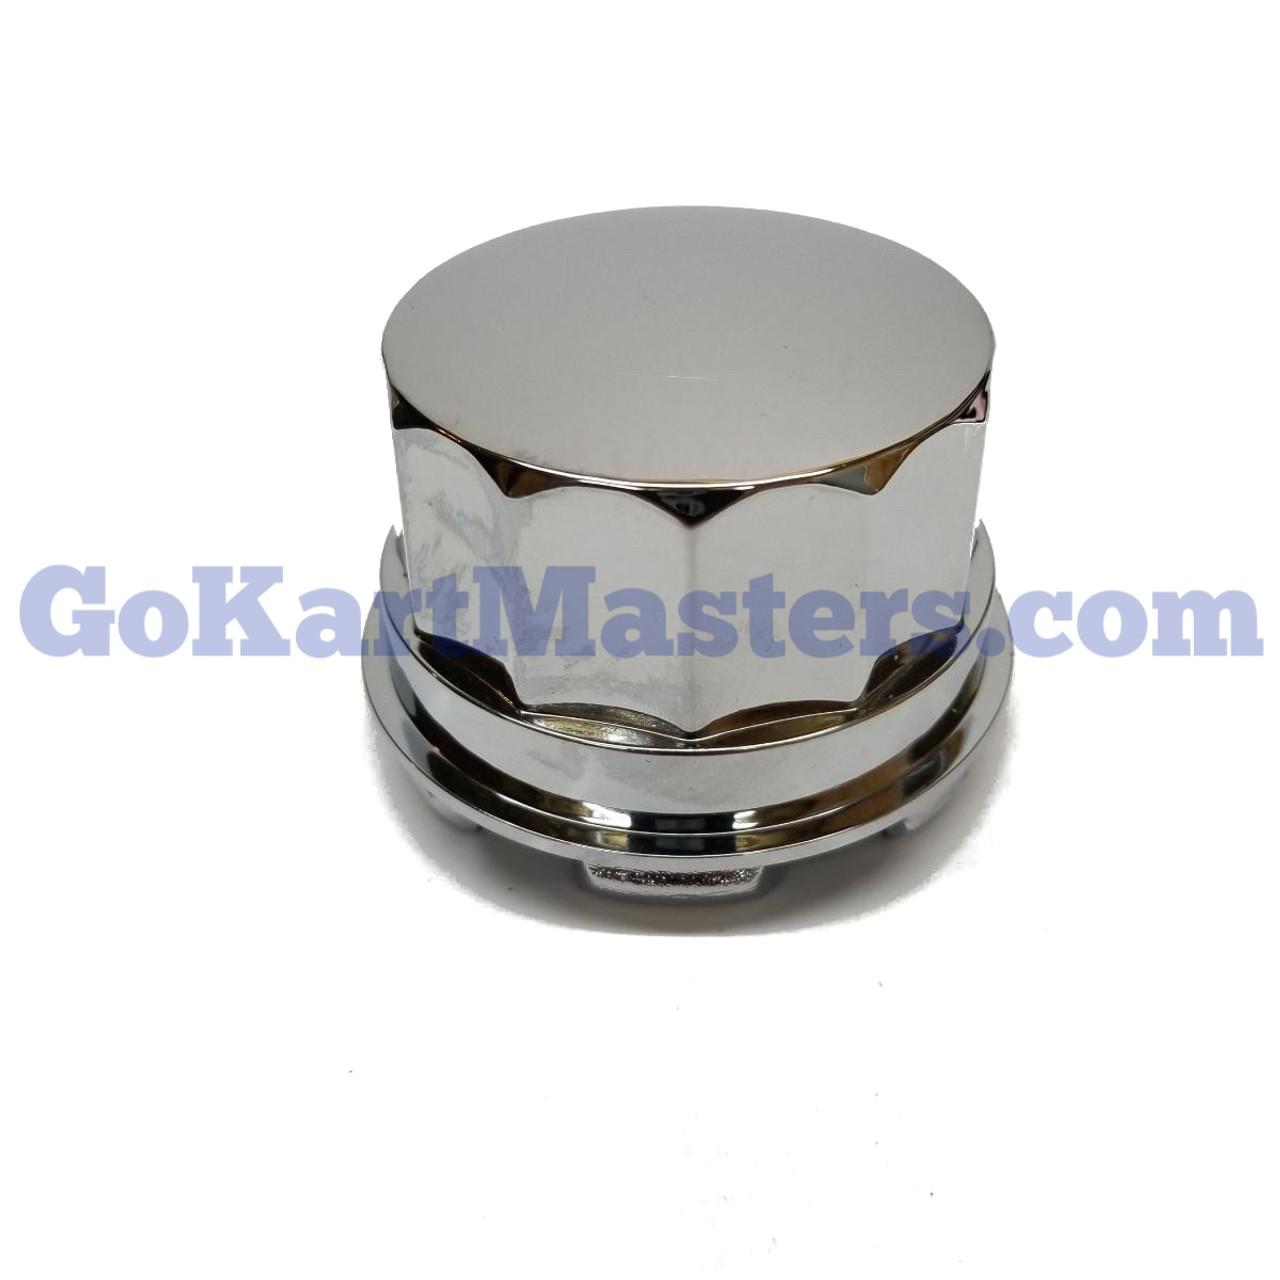 TrailMaster Blazer 150X Chrome Hub Cap